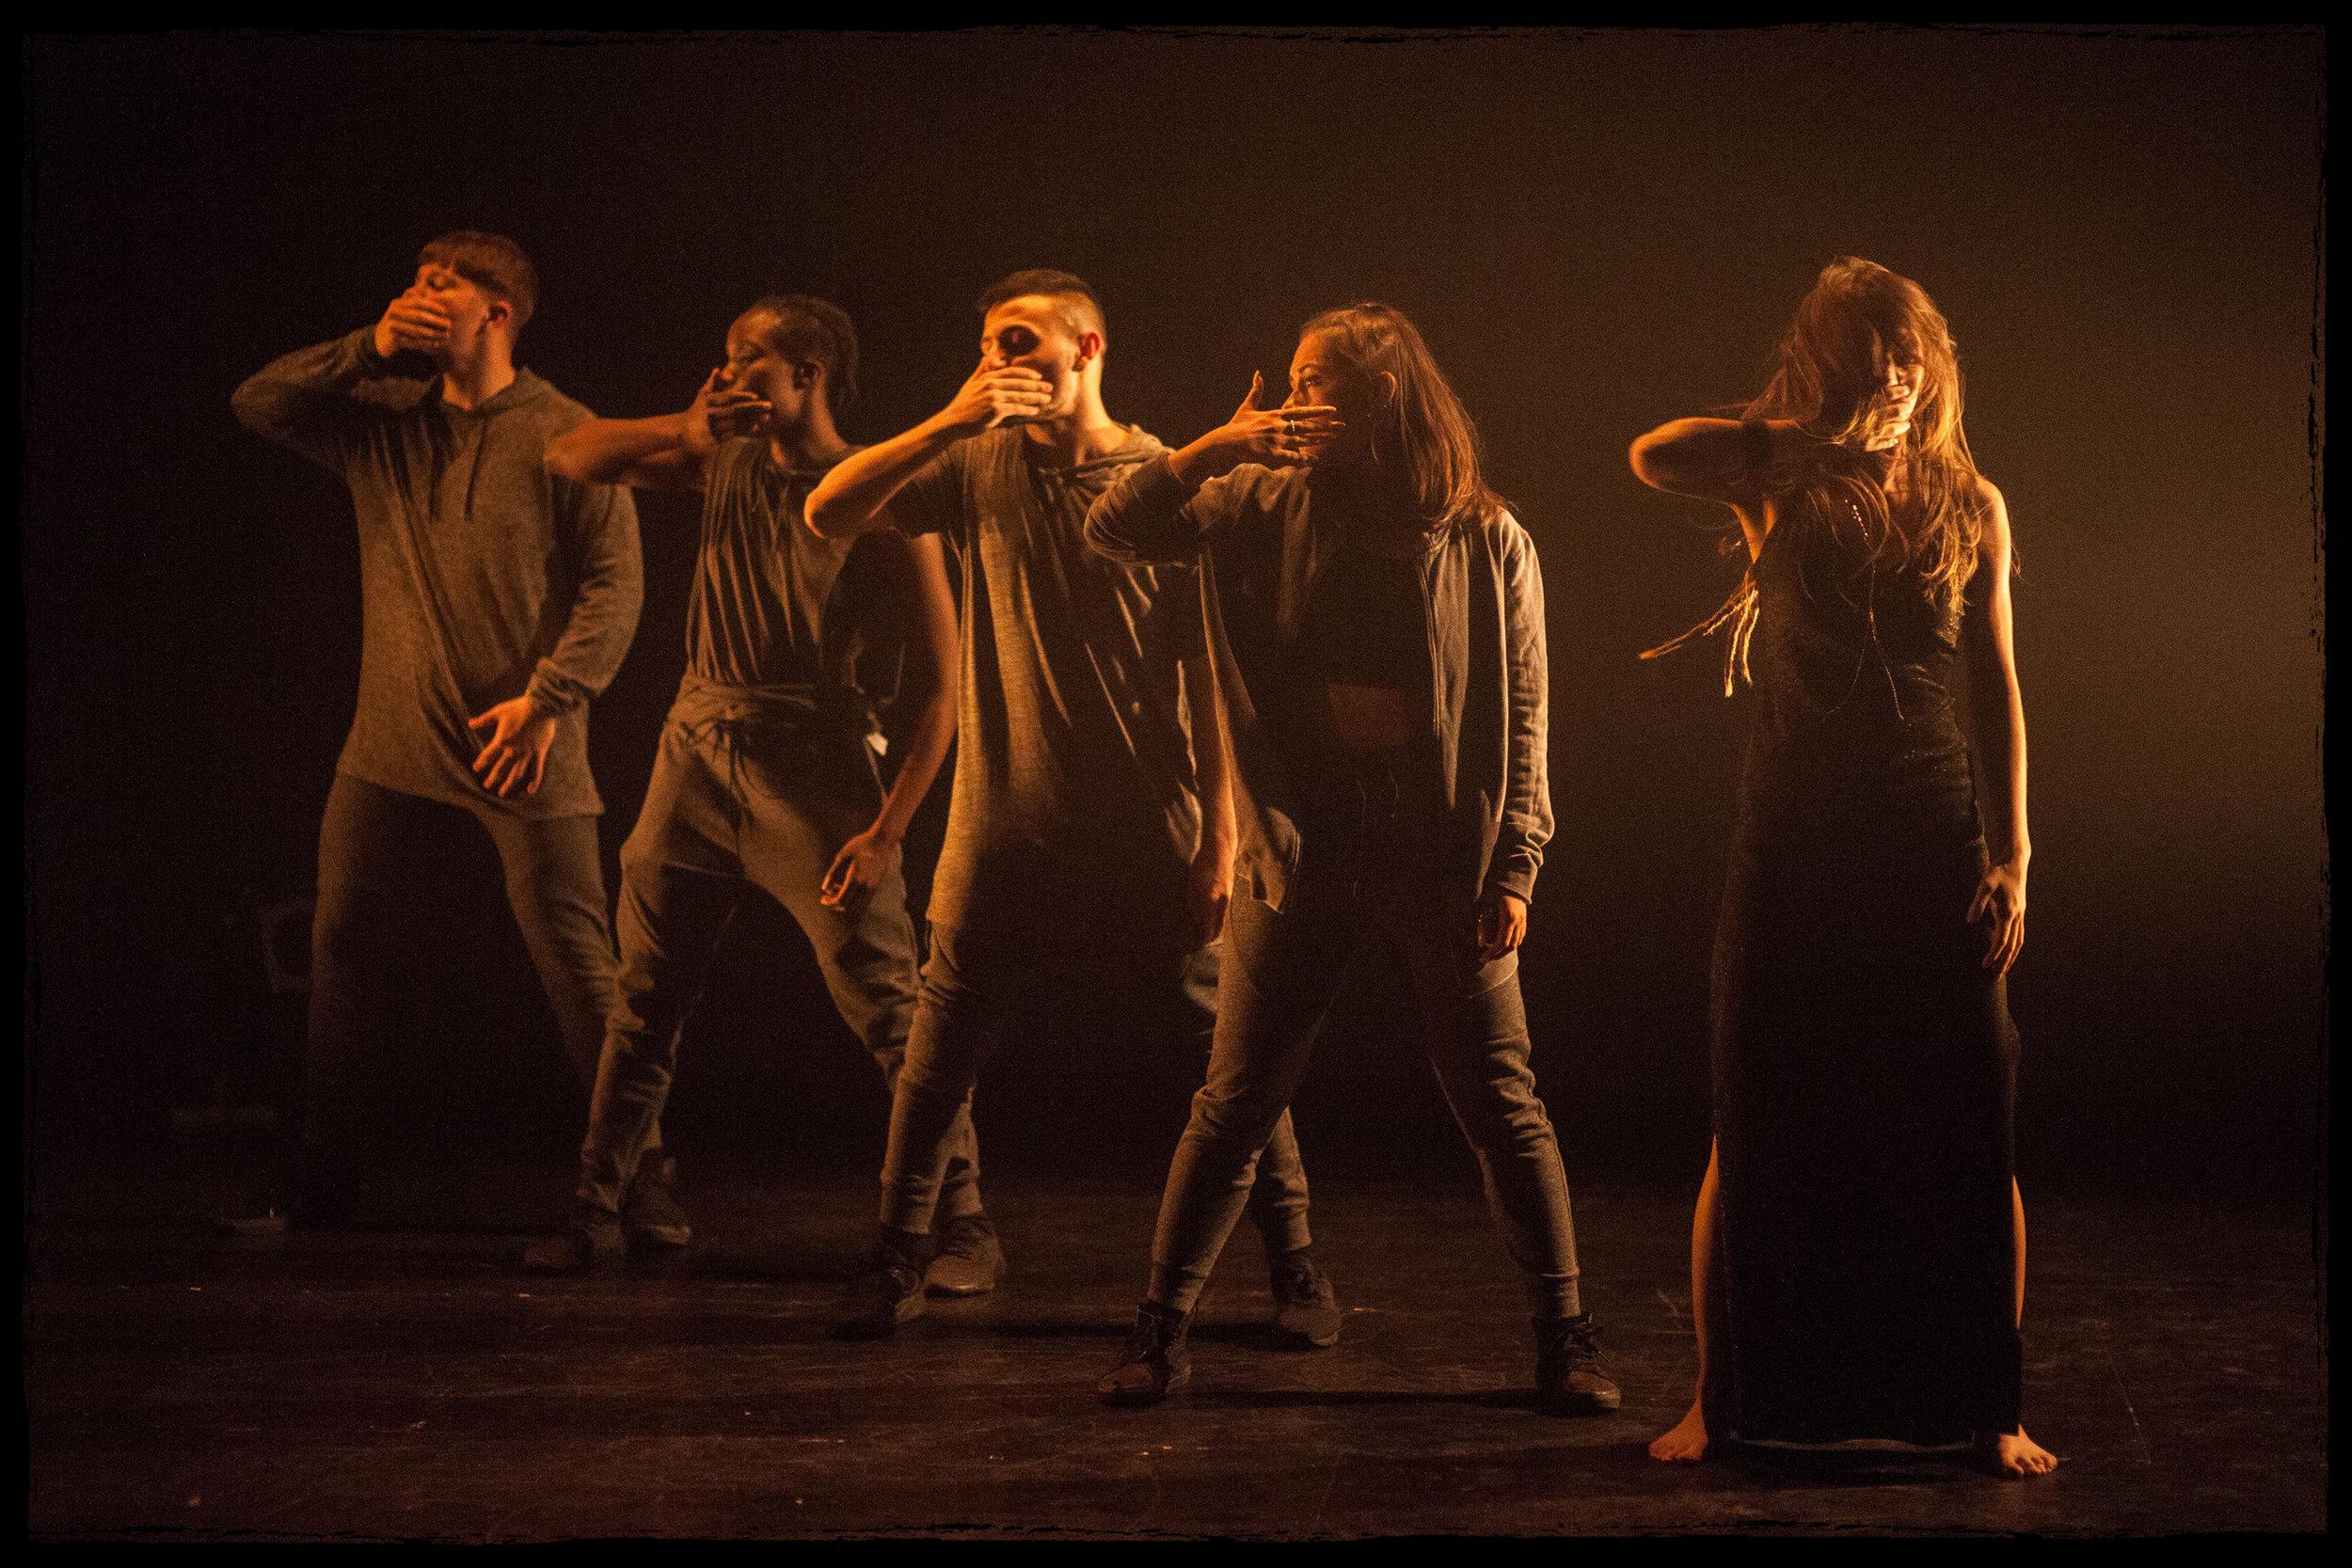 201 Dance Company - SKIN, 2018. Photo credit: Chris Nash.